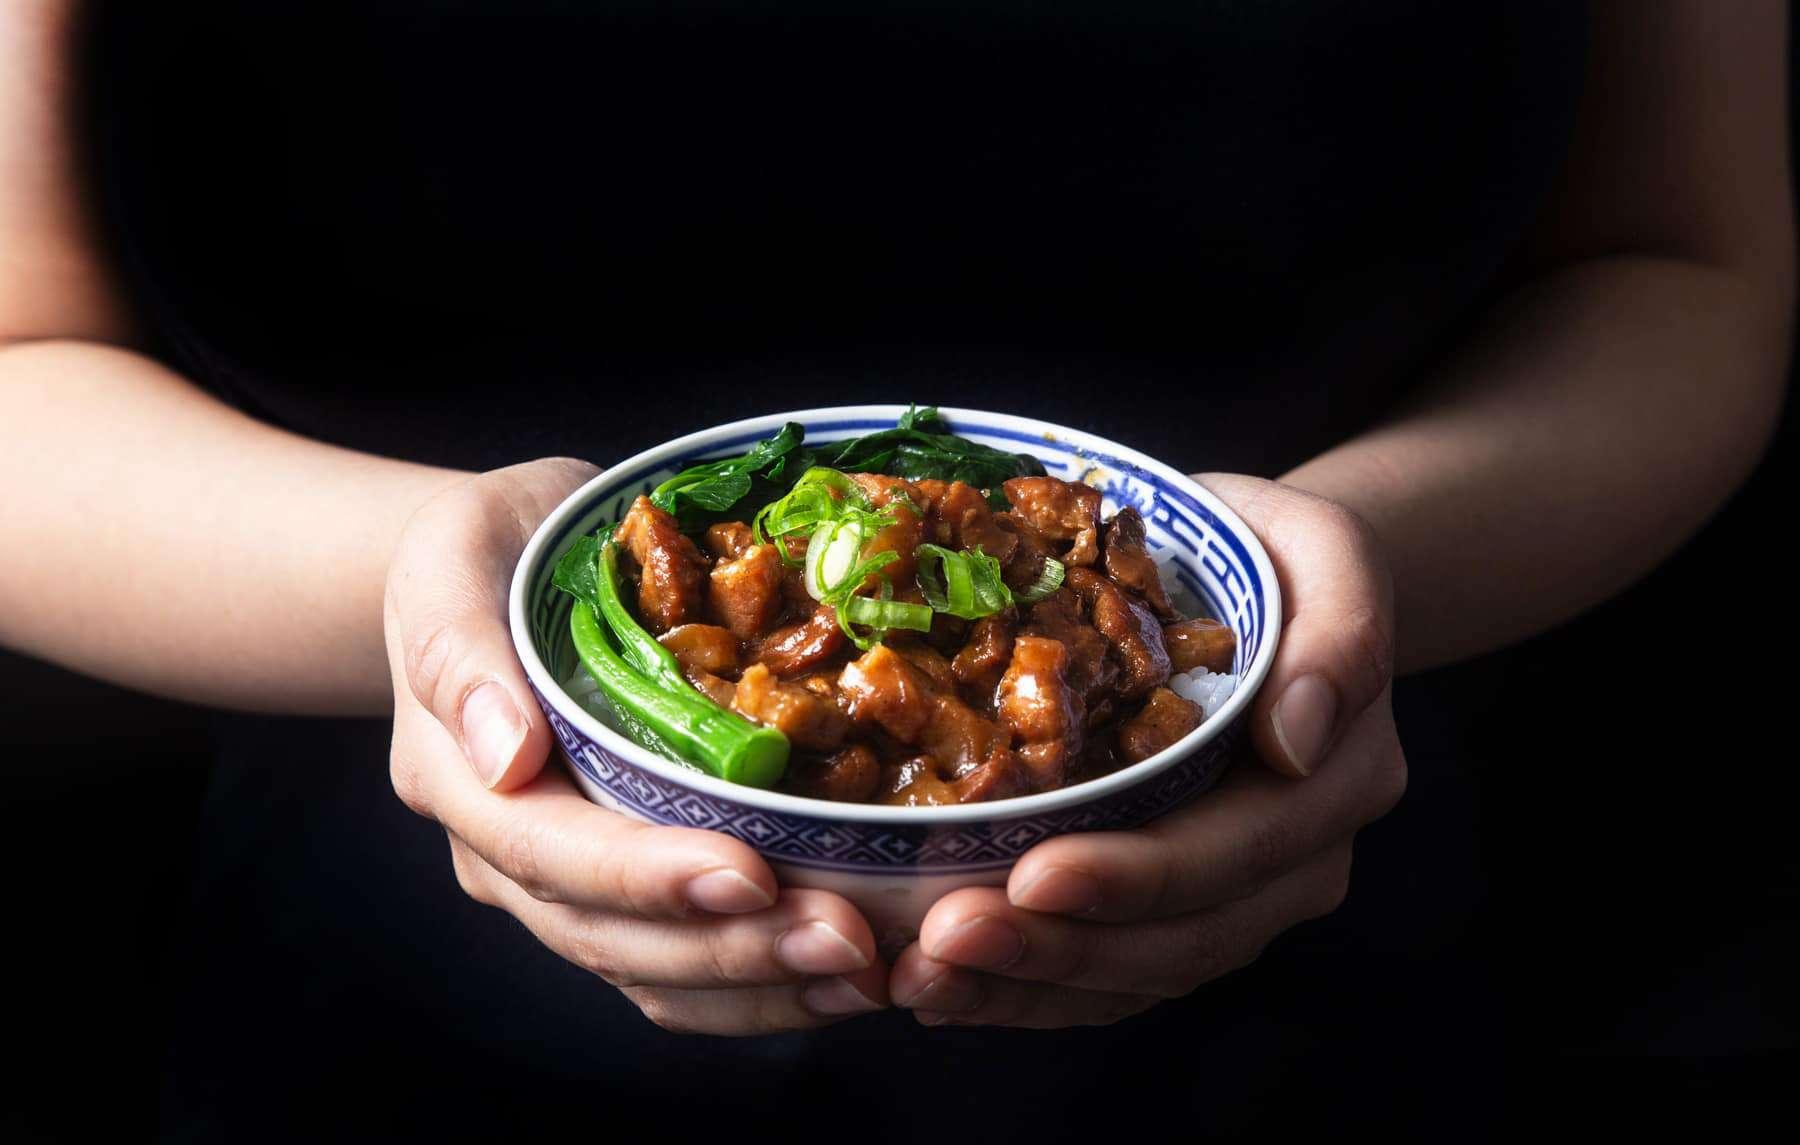 Instant Pot lu rou fan   滷肉飯   pressure cooker lu rou fan   taiwanese braised pork   taiwanese braised pork belly   instant pot pork   pork belly recipes   ru rou fan   taiwanese pork rice   taiwanese minced pork #AmyJacky #InstantPot #PressureCooker #recipes #taiwanese #asian #pork